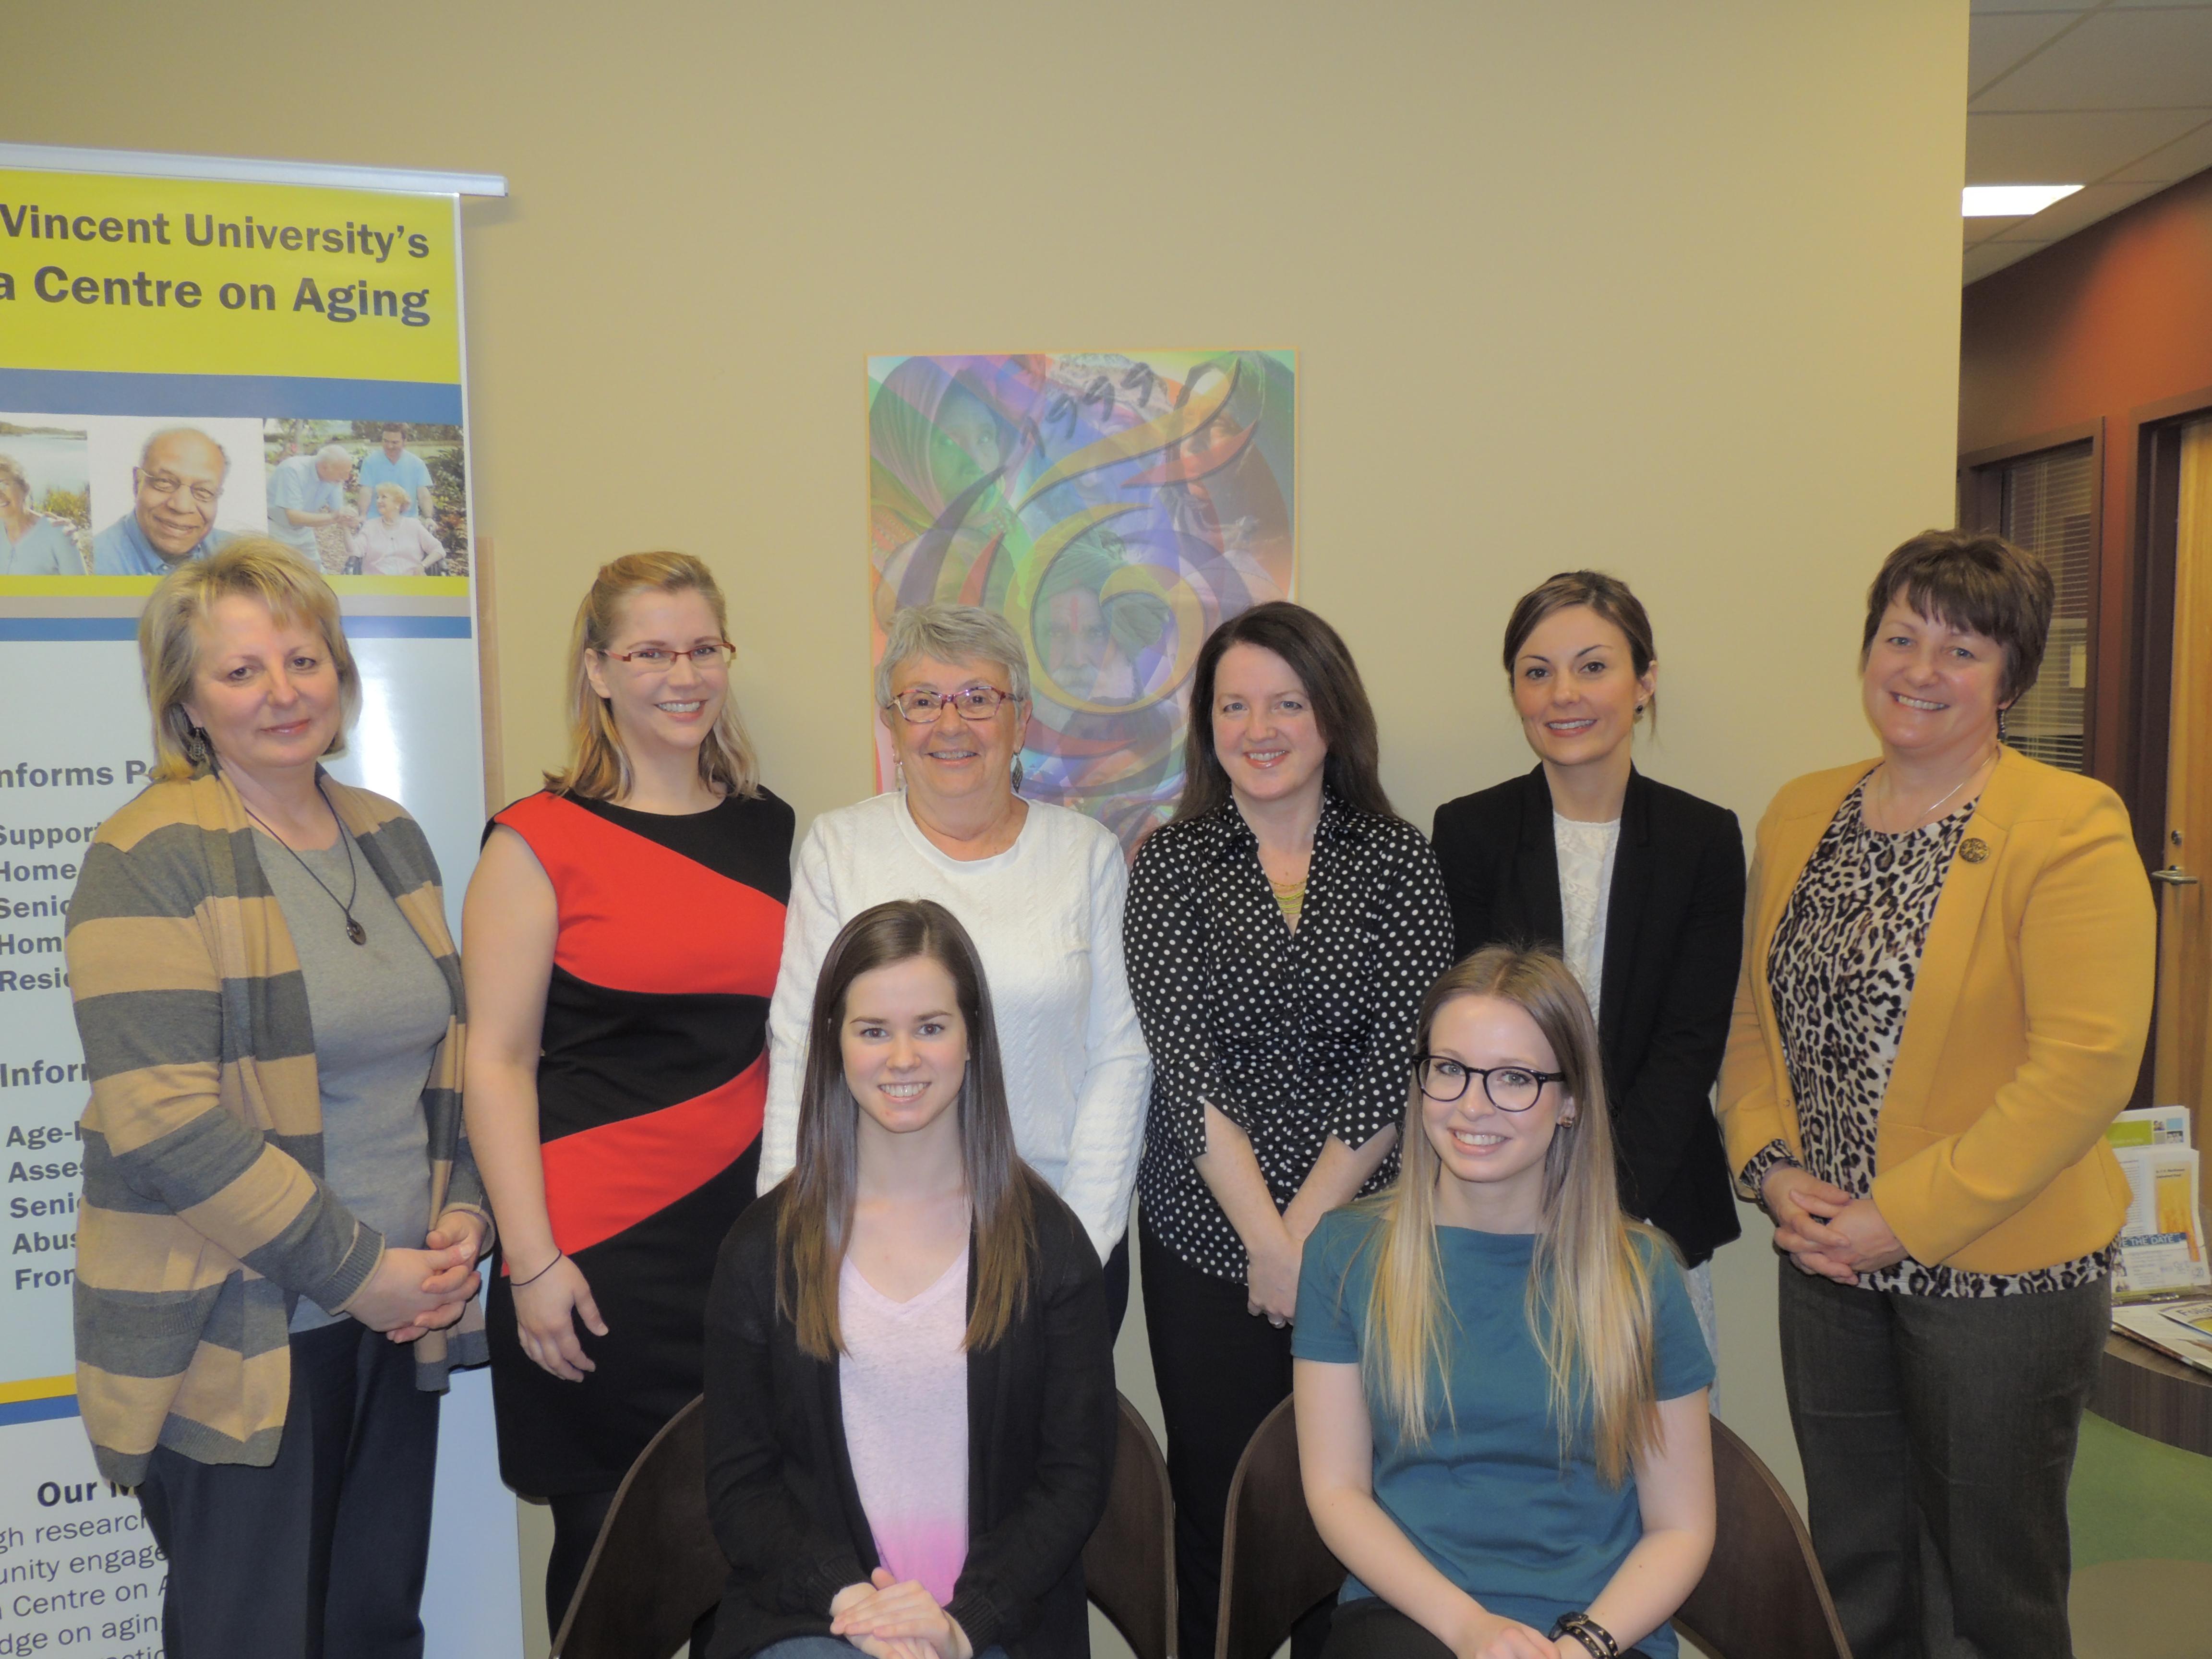 Nova Scotia Centre on Aging (NSCA) group photo